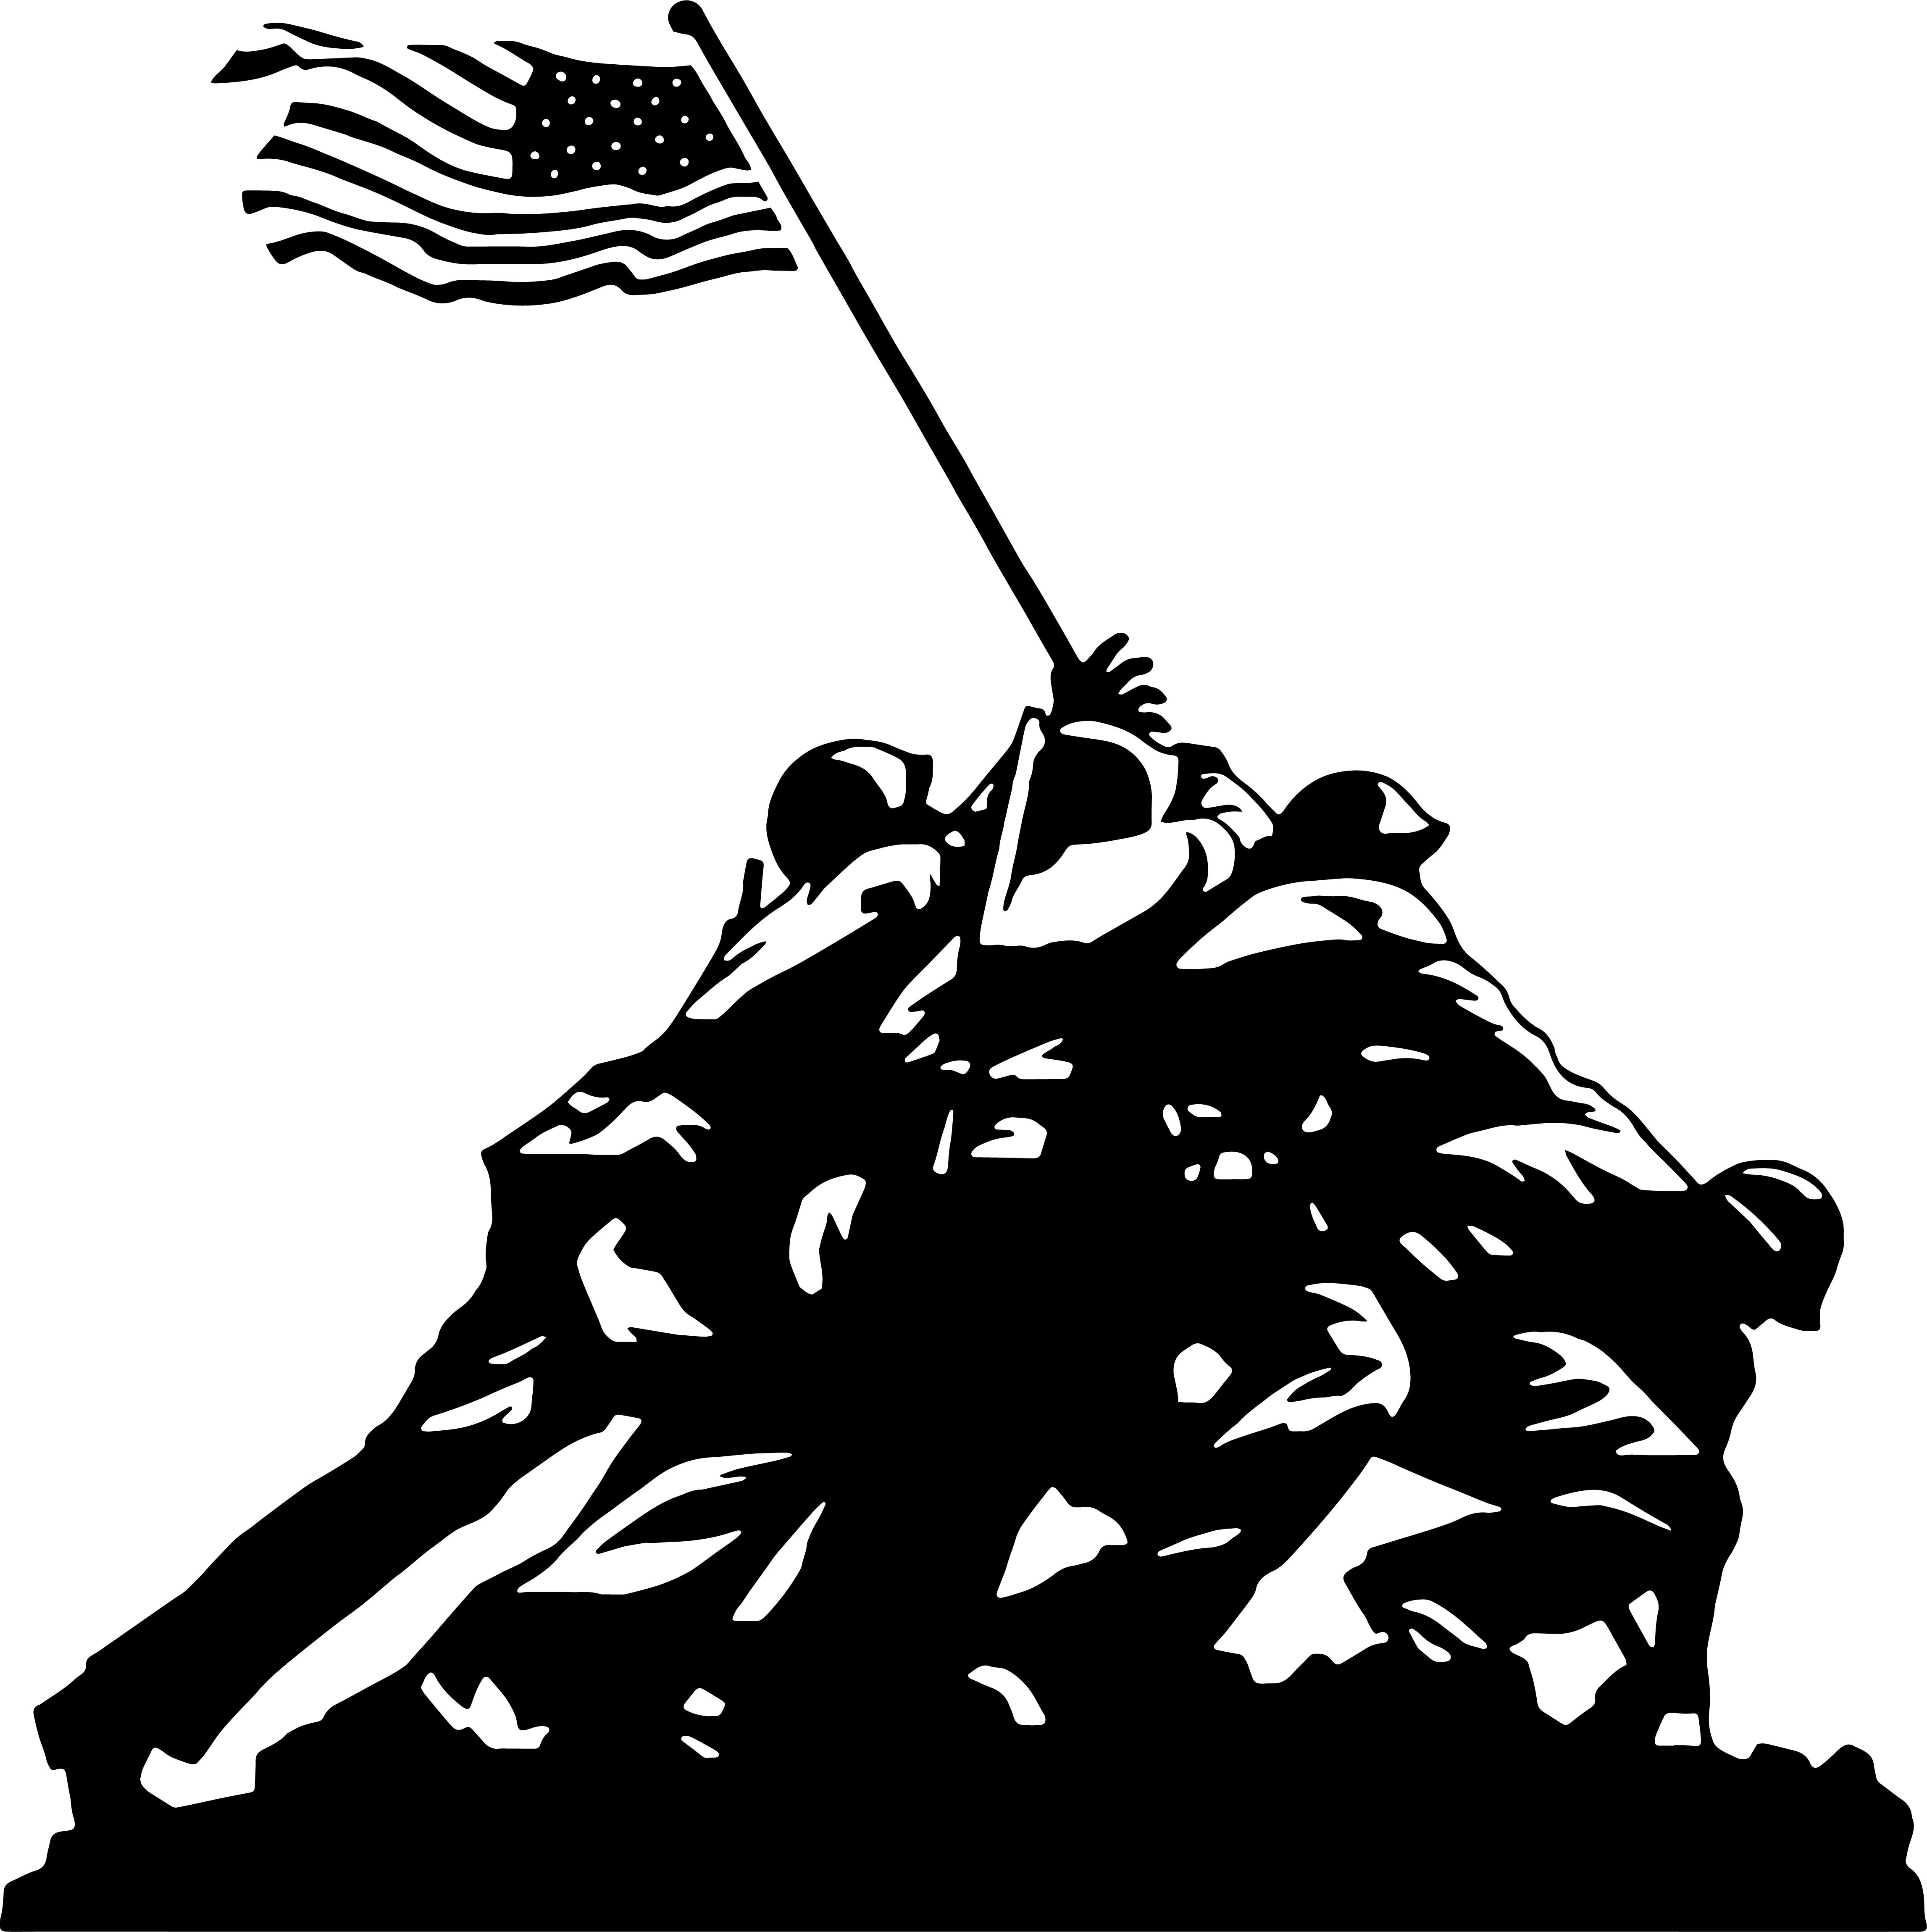 Iwo Jima clipart #2, Download drawings